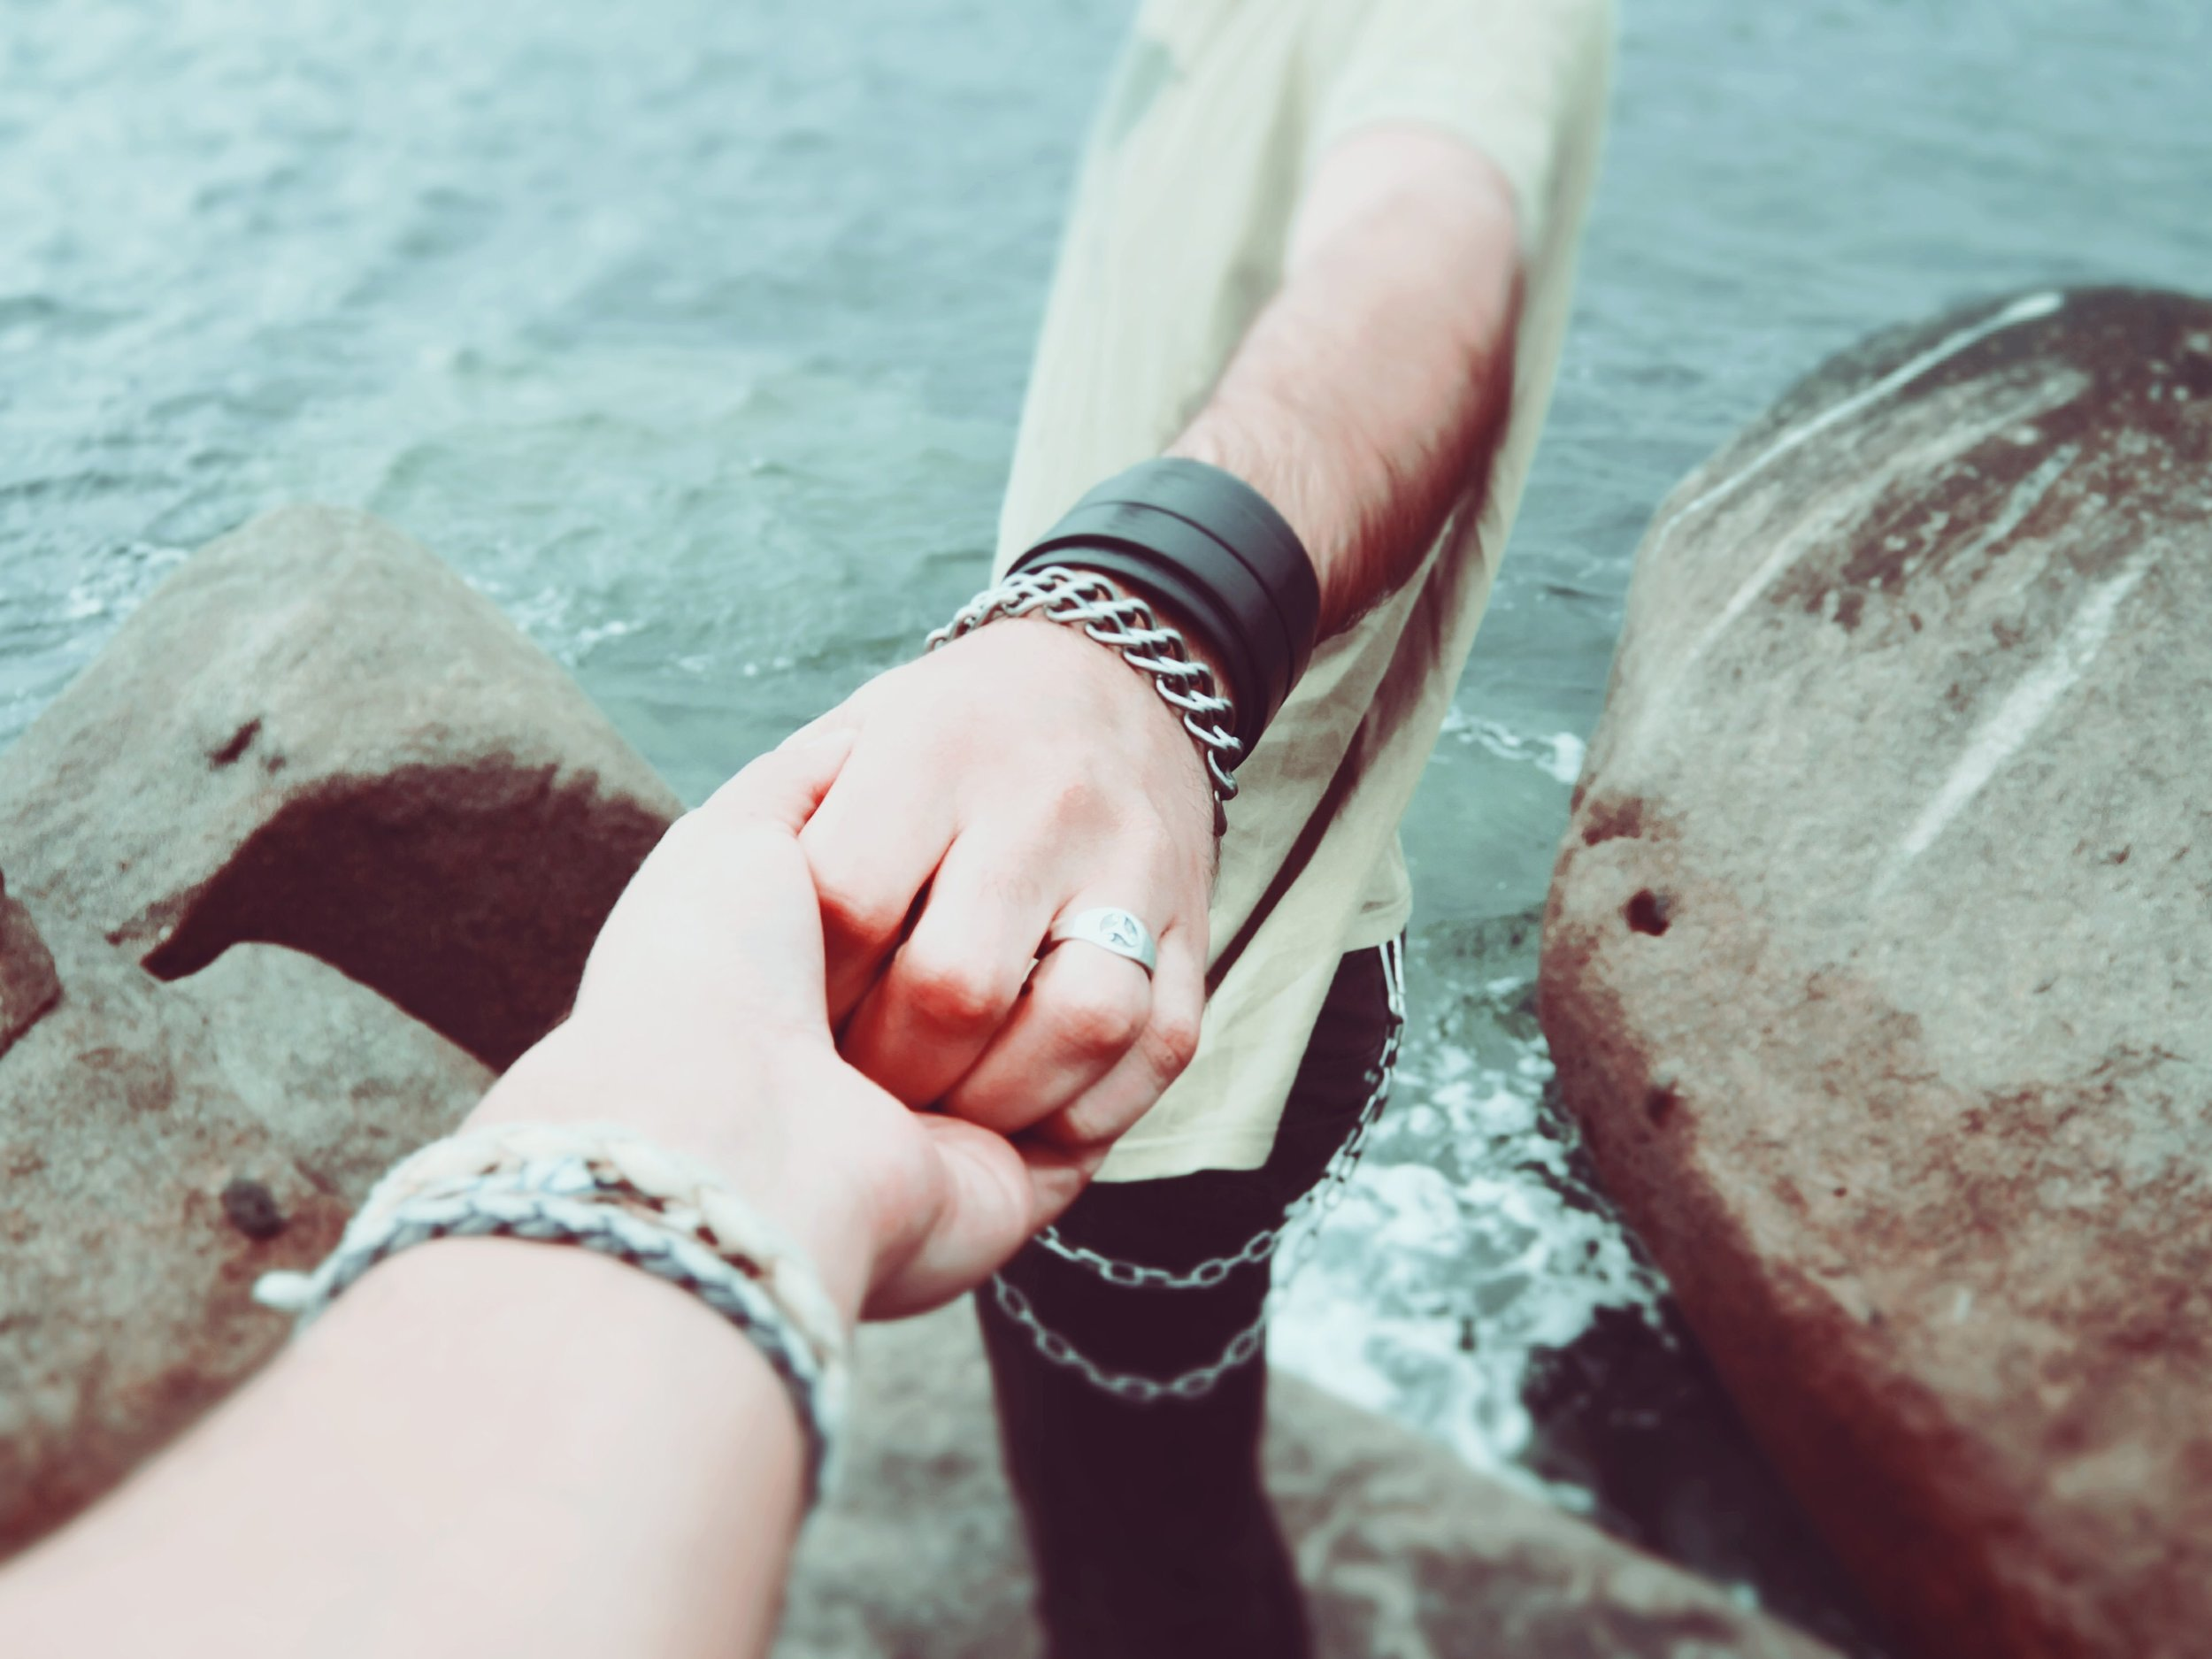 HebrewDawn: unconditional tenderness